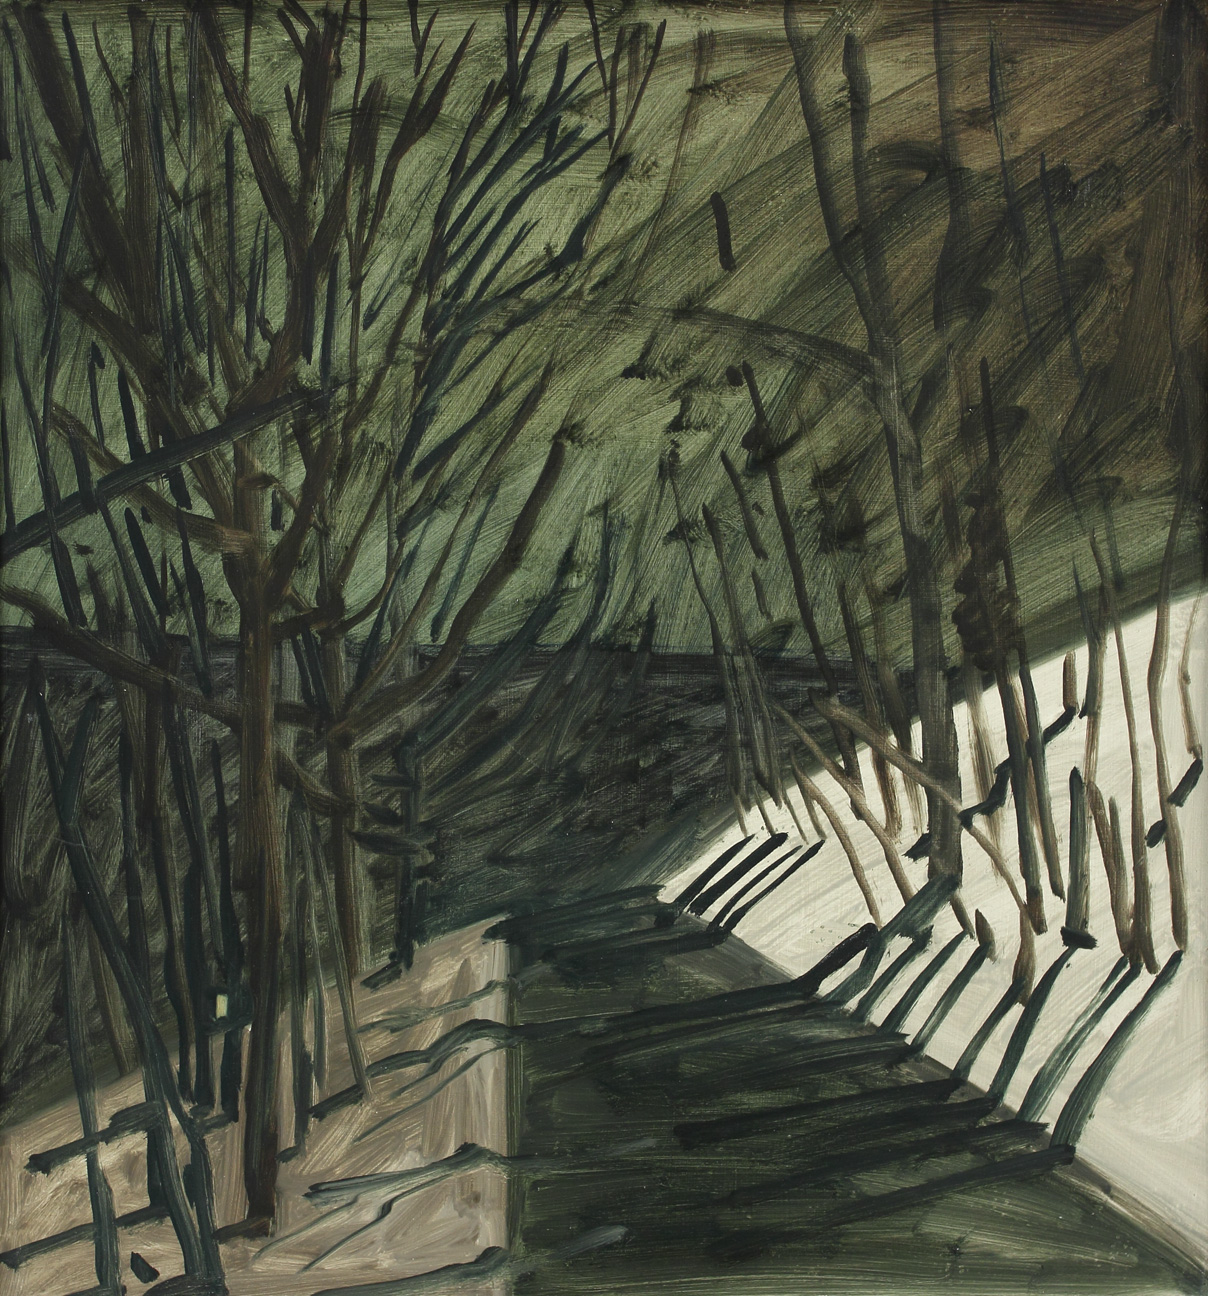 Lois Dodd ,Moonlit Road, NJ, 1976 , Oil on masonite , Alexandre Gallery.